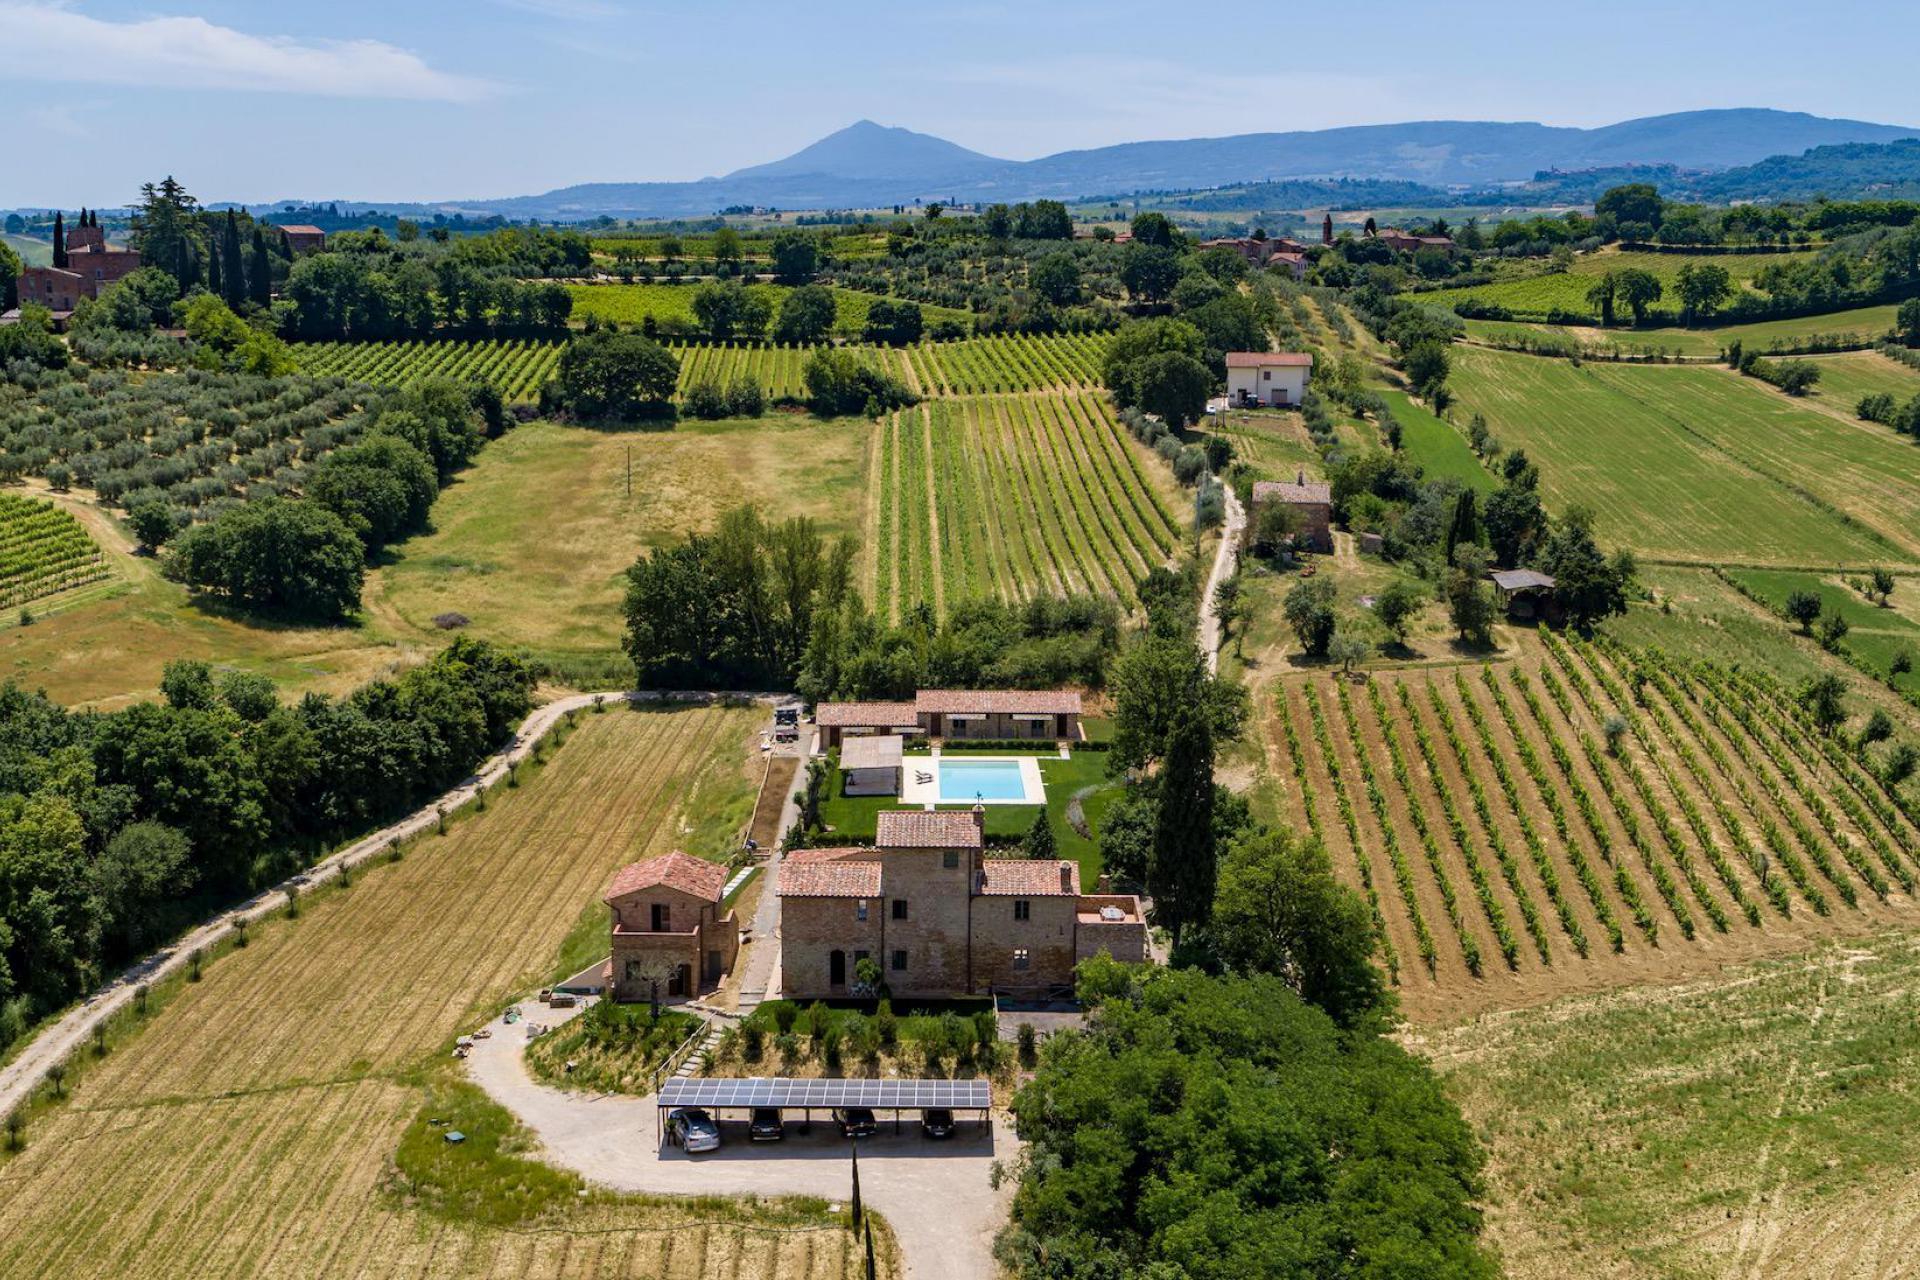 Agriturismo Toscane Panoramische gelegen agriturismo in Toscane